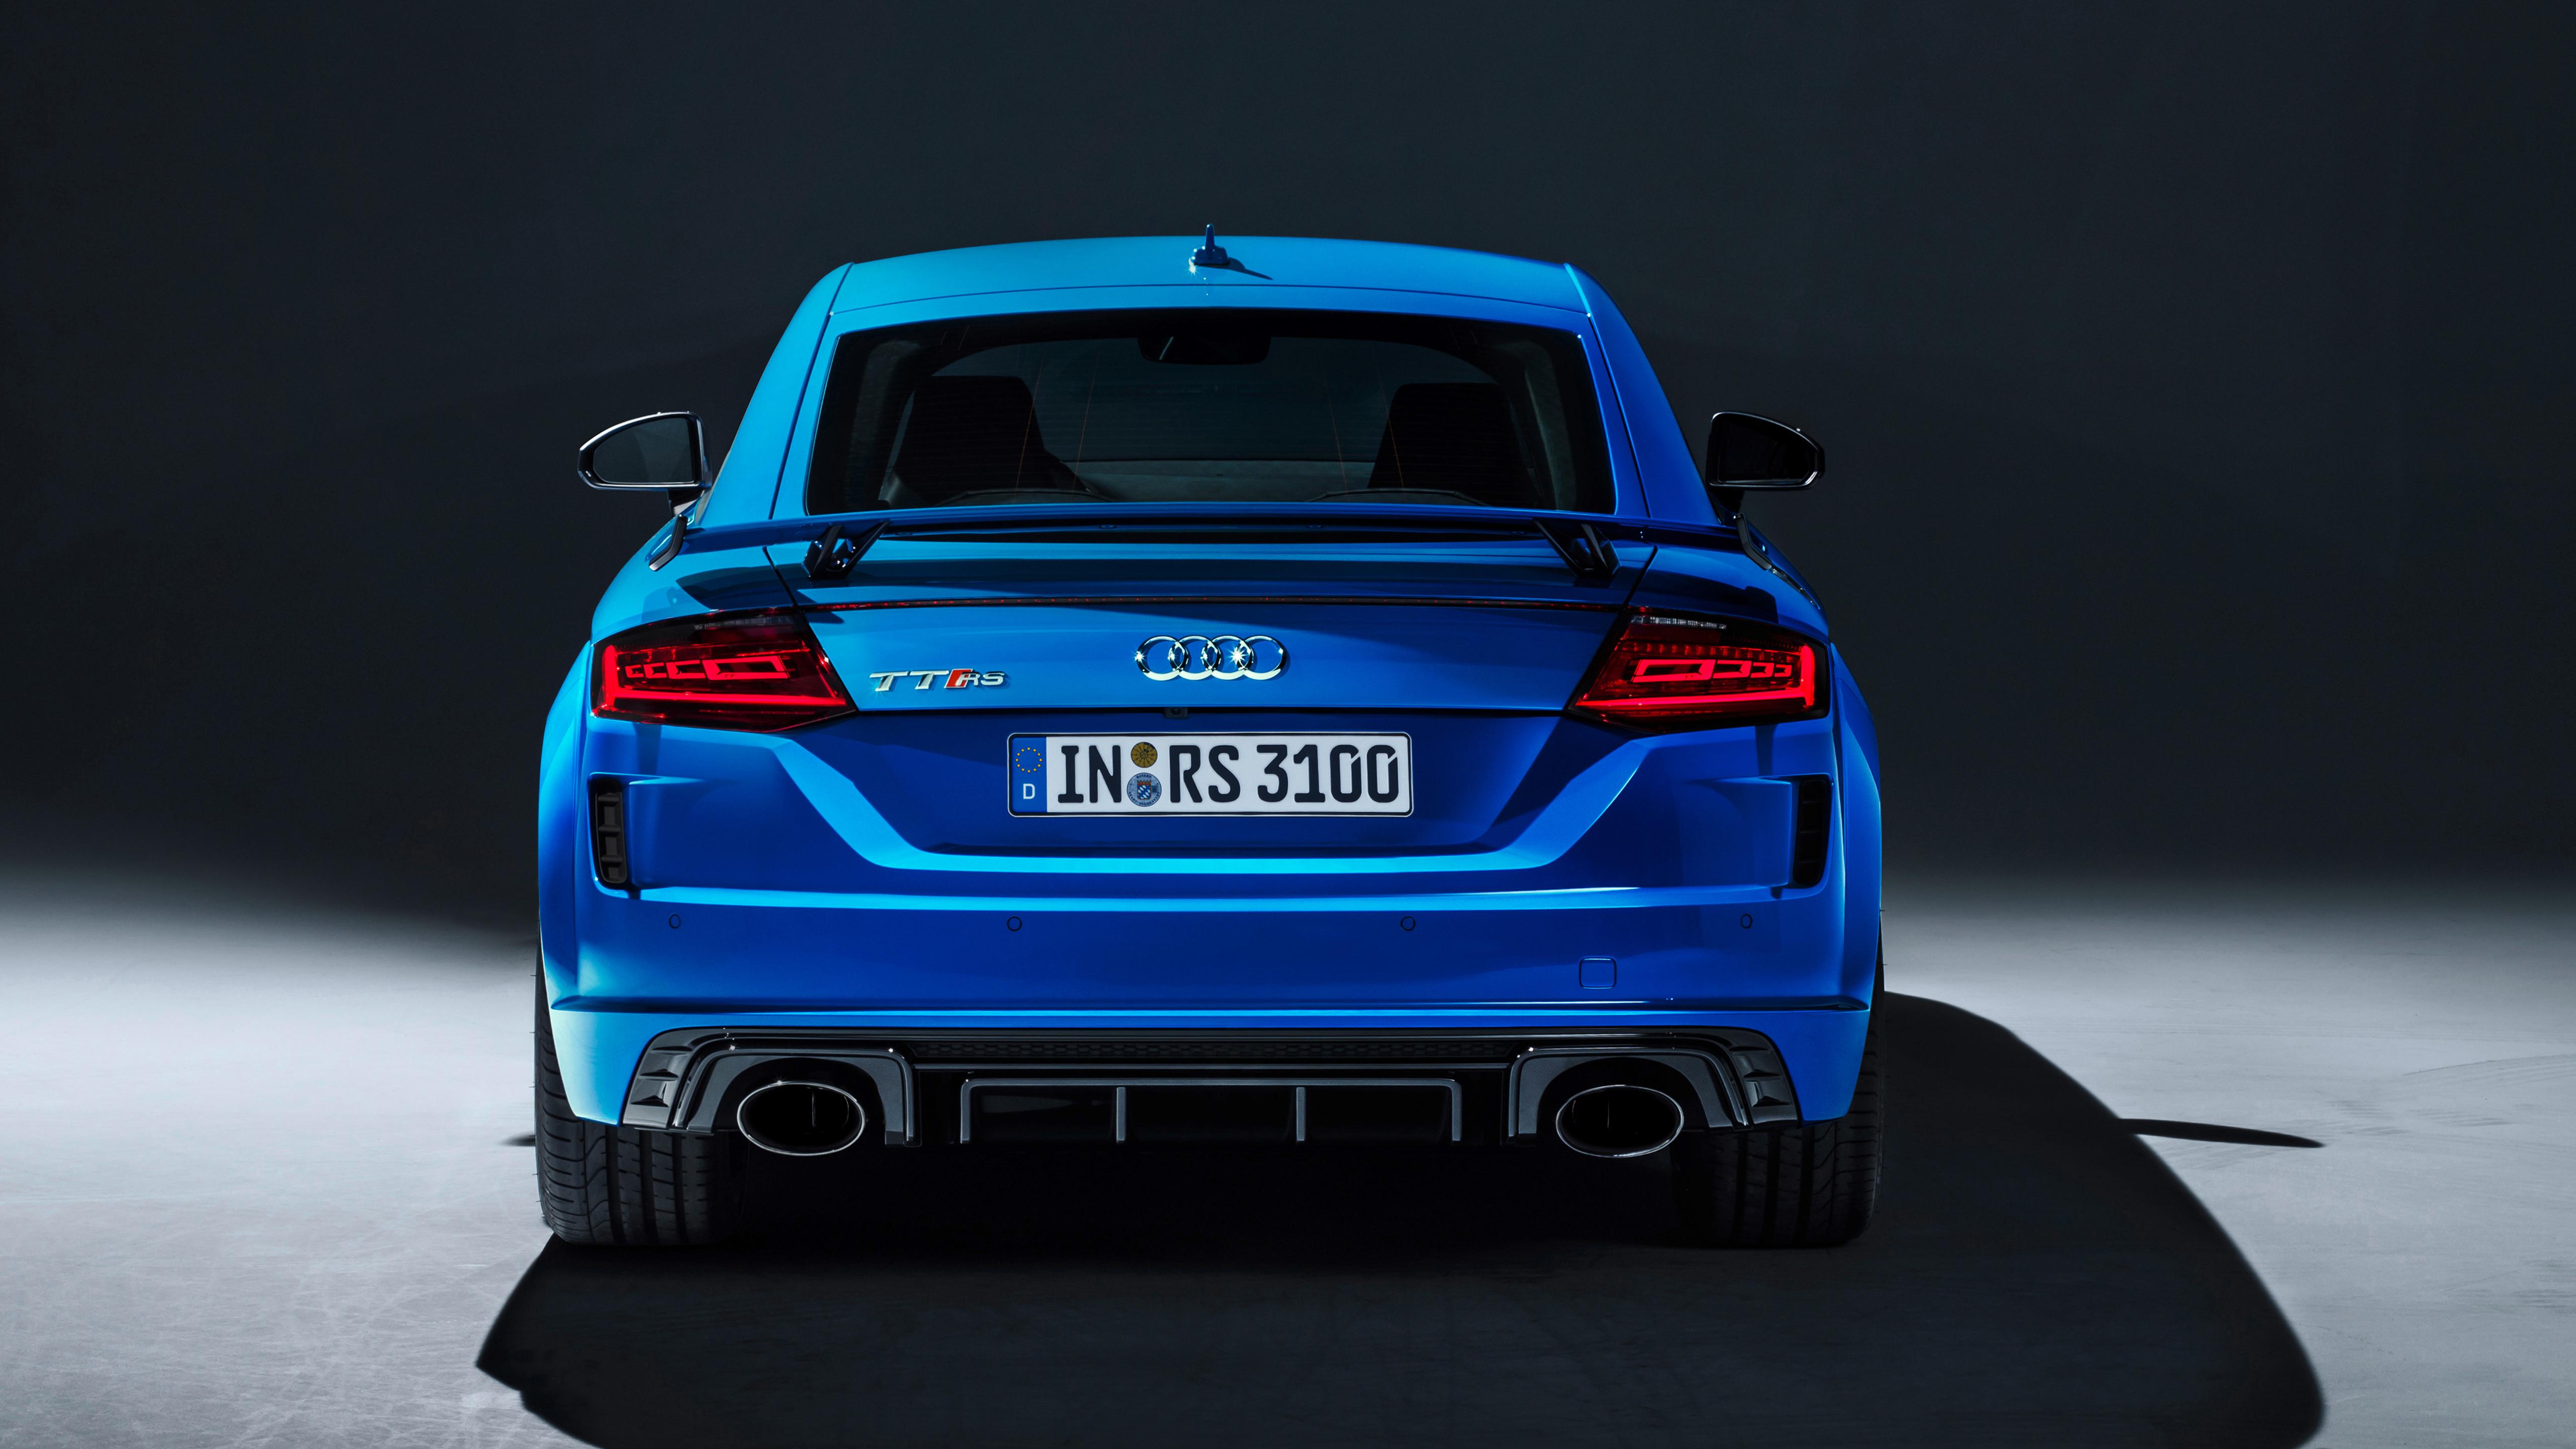 Audi Tt Rs Coupe 2019 5k Wallpaper Hd Car Wallpapers Id